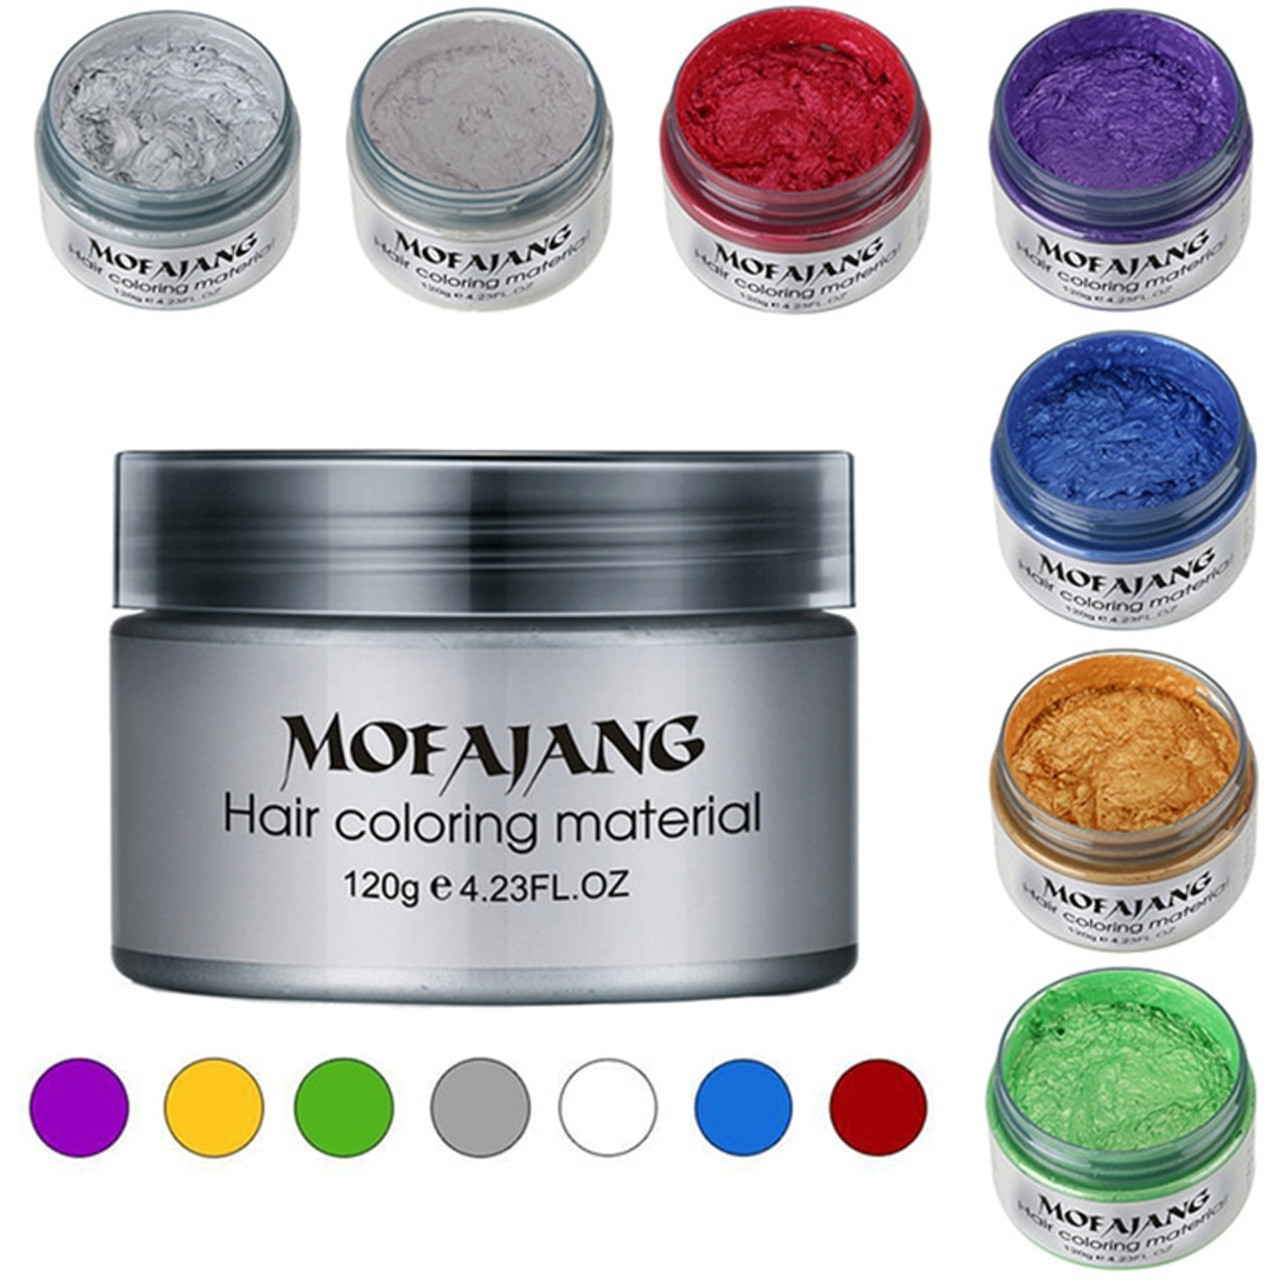 MOFAJANG Hair Color Styling Promades Wax Silver Ash Grey Strong Hold ...